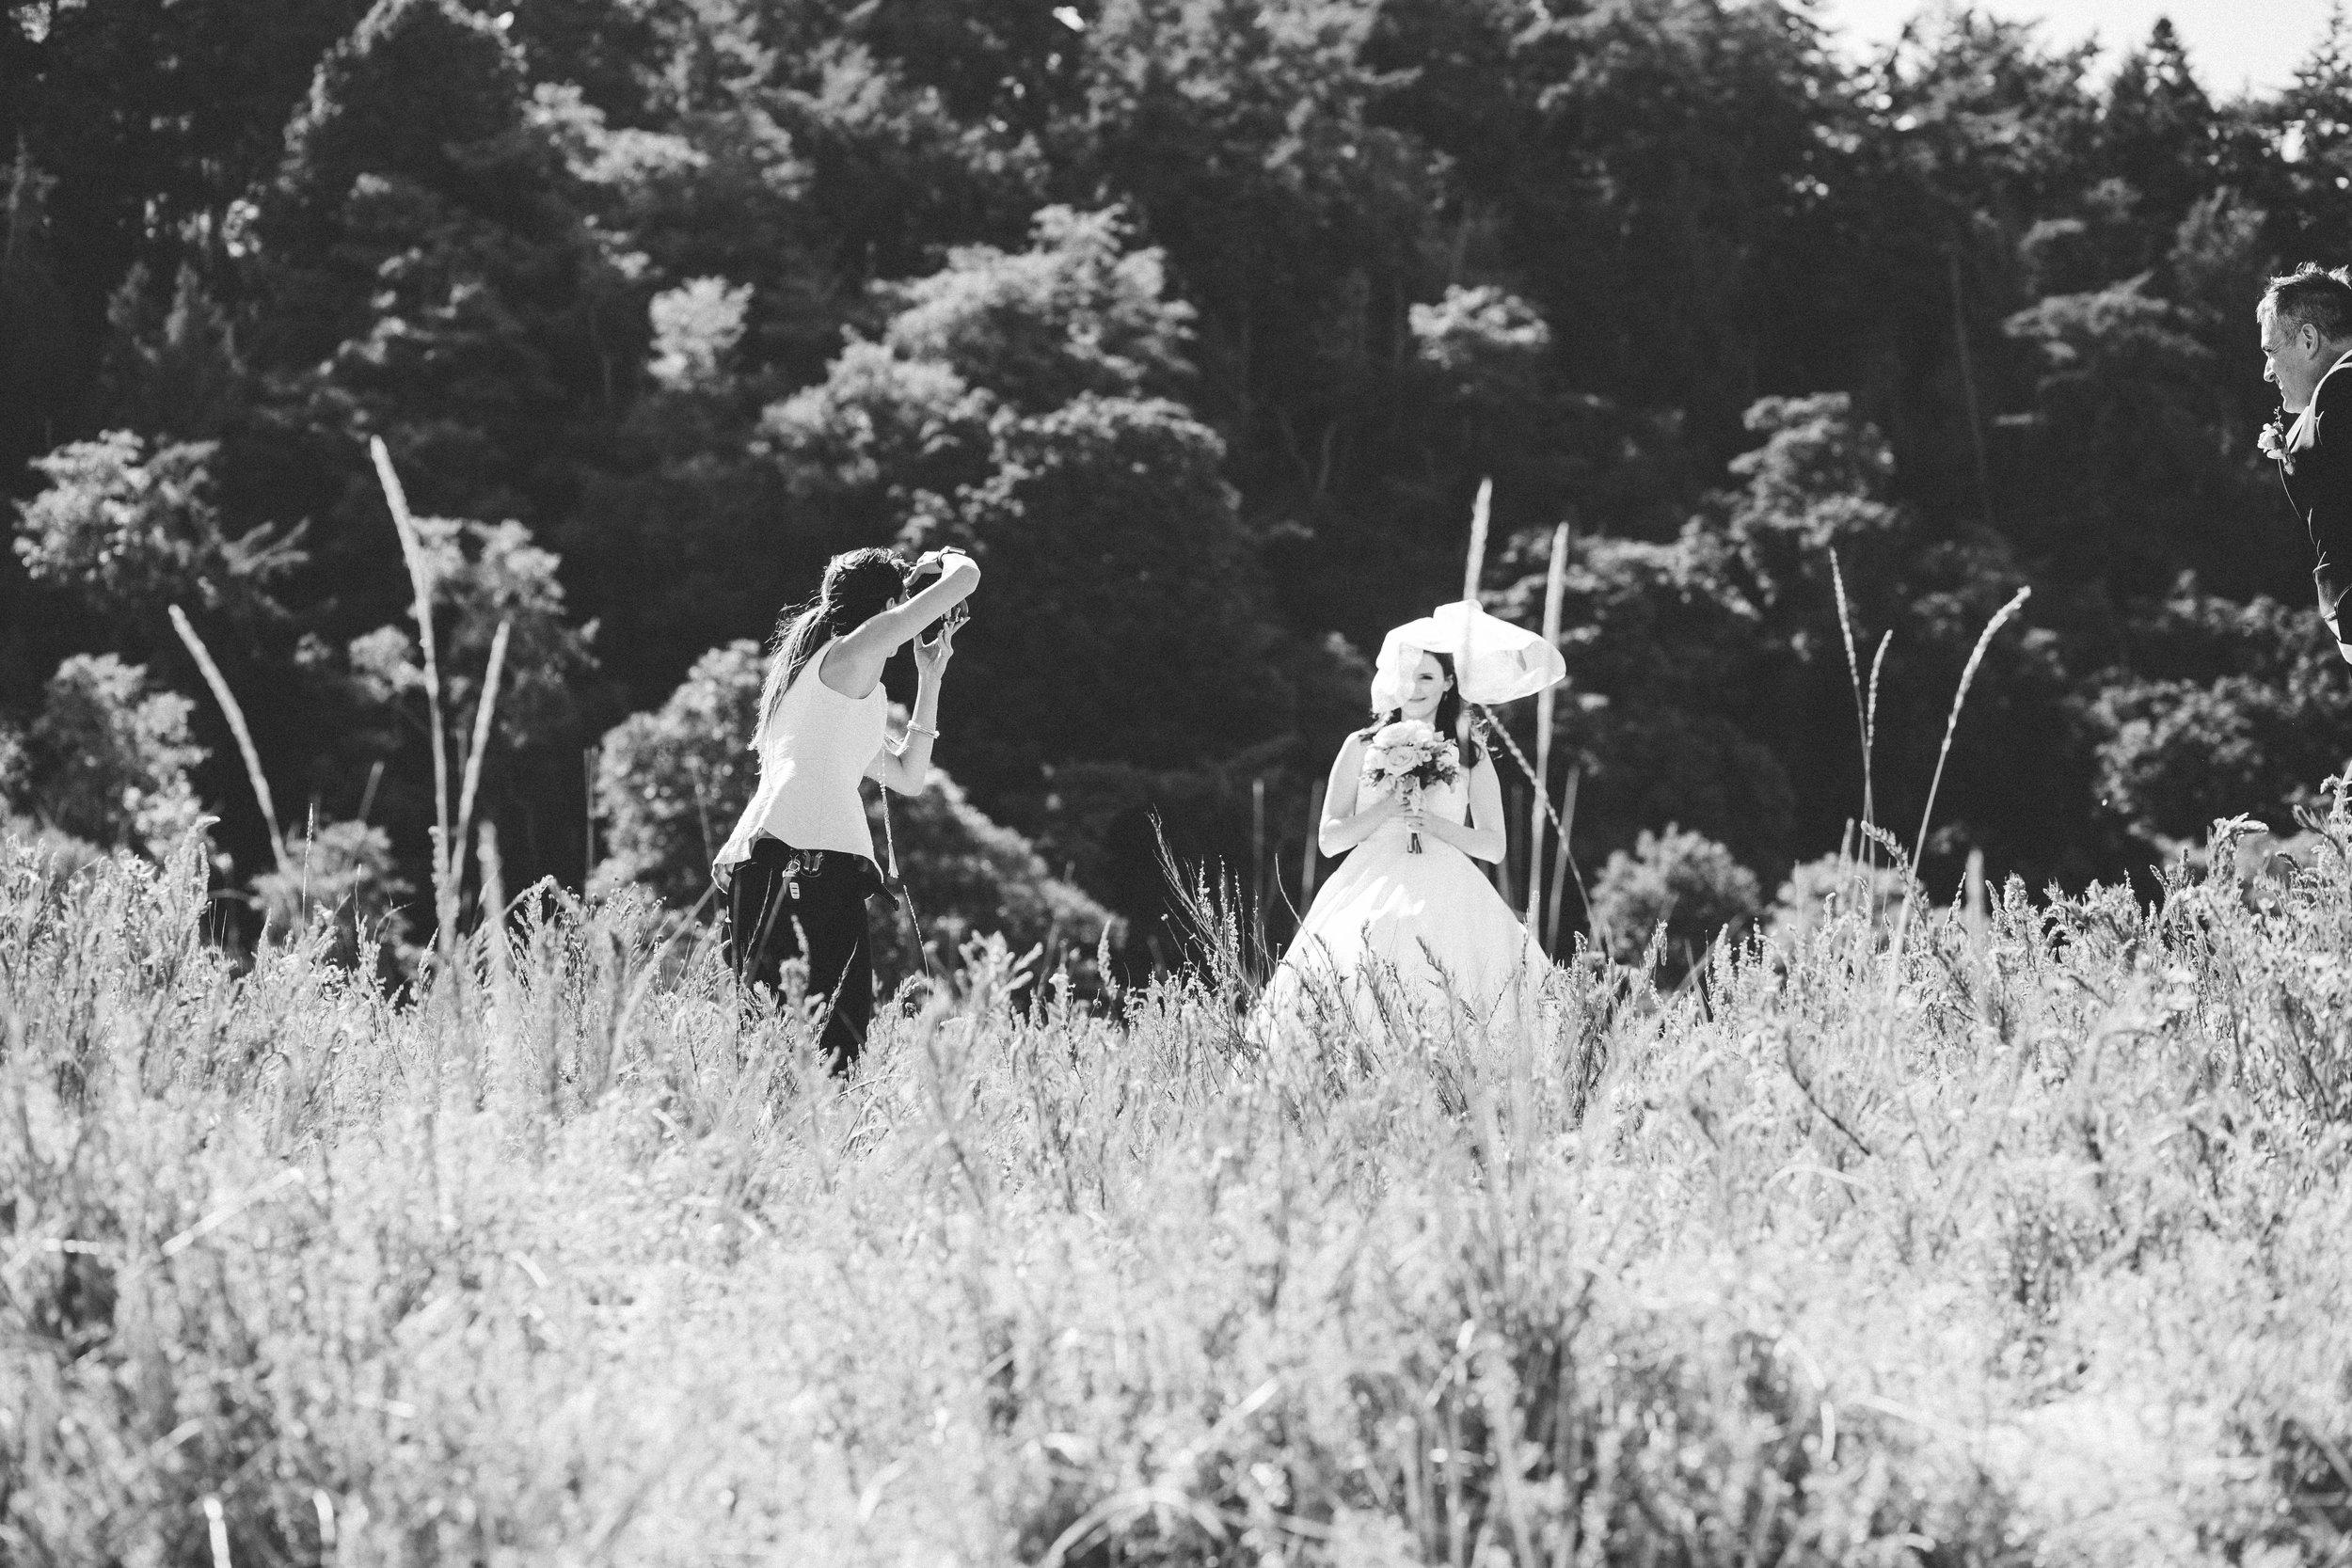 Adina_Portraits_2017_by_Jared_Seattle_wedding_photographer_14.JPG